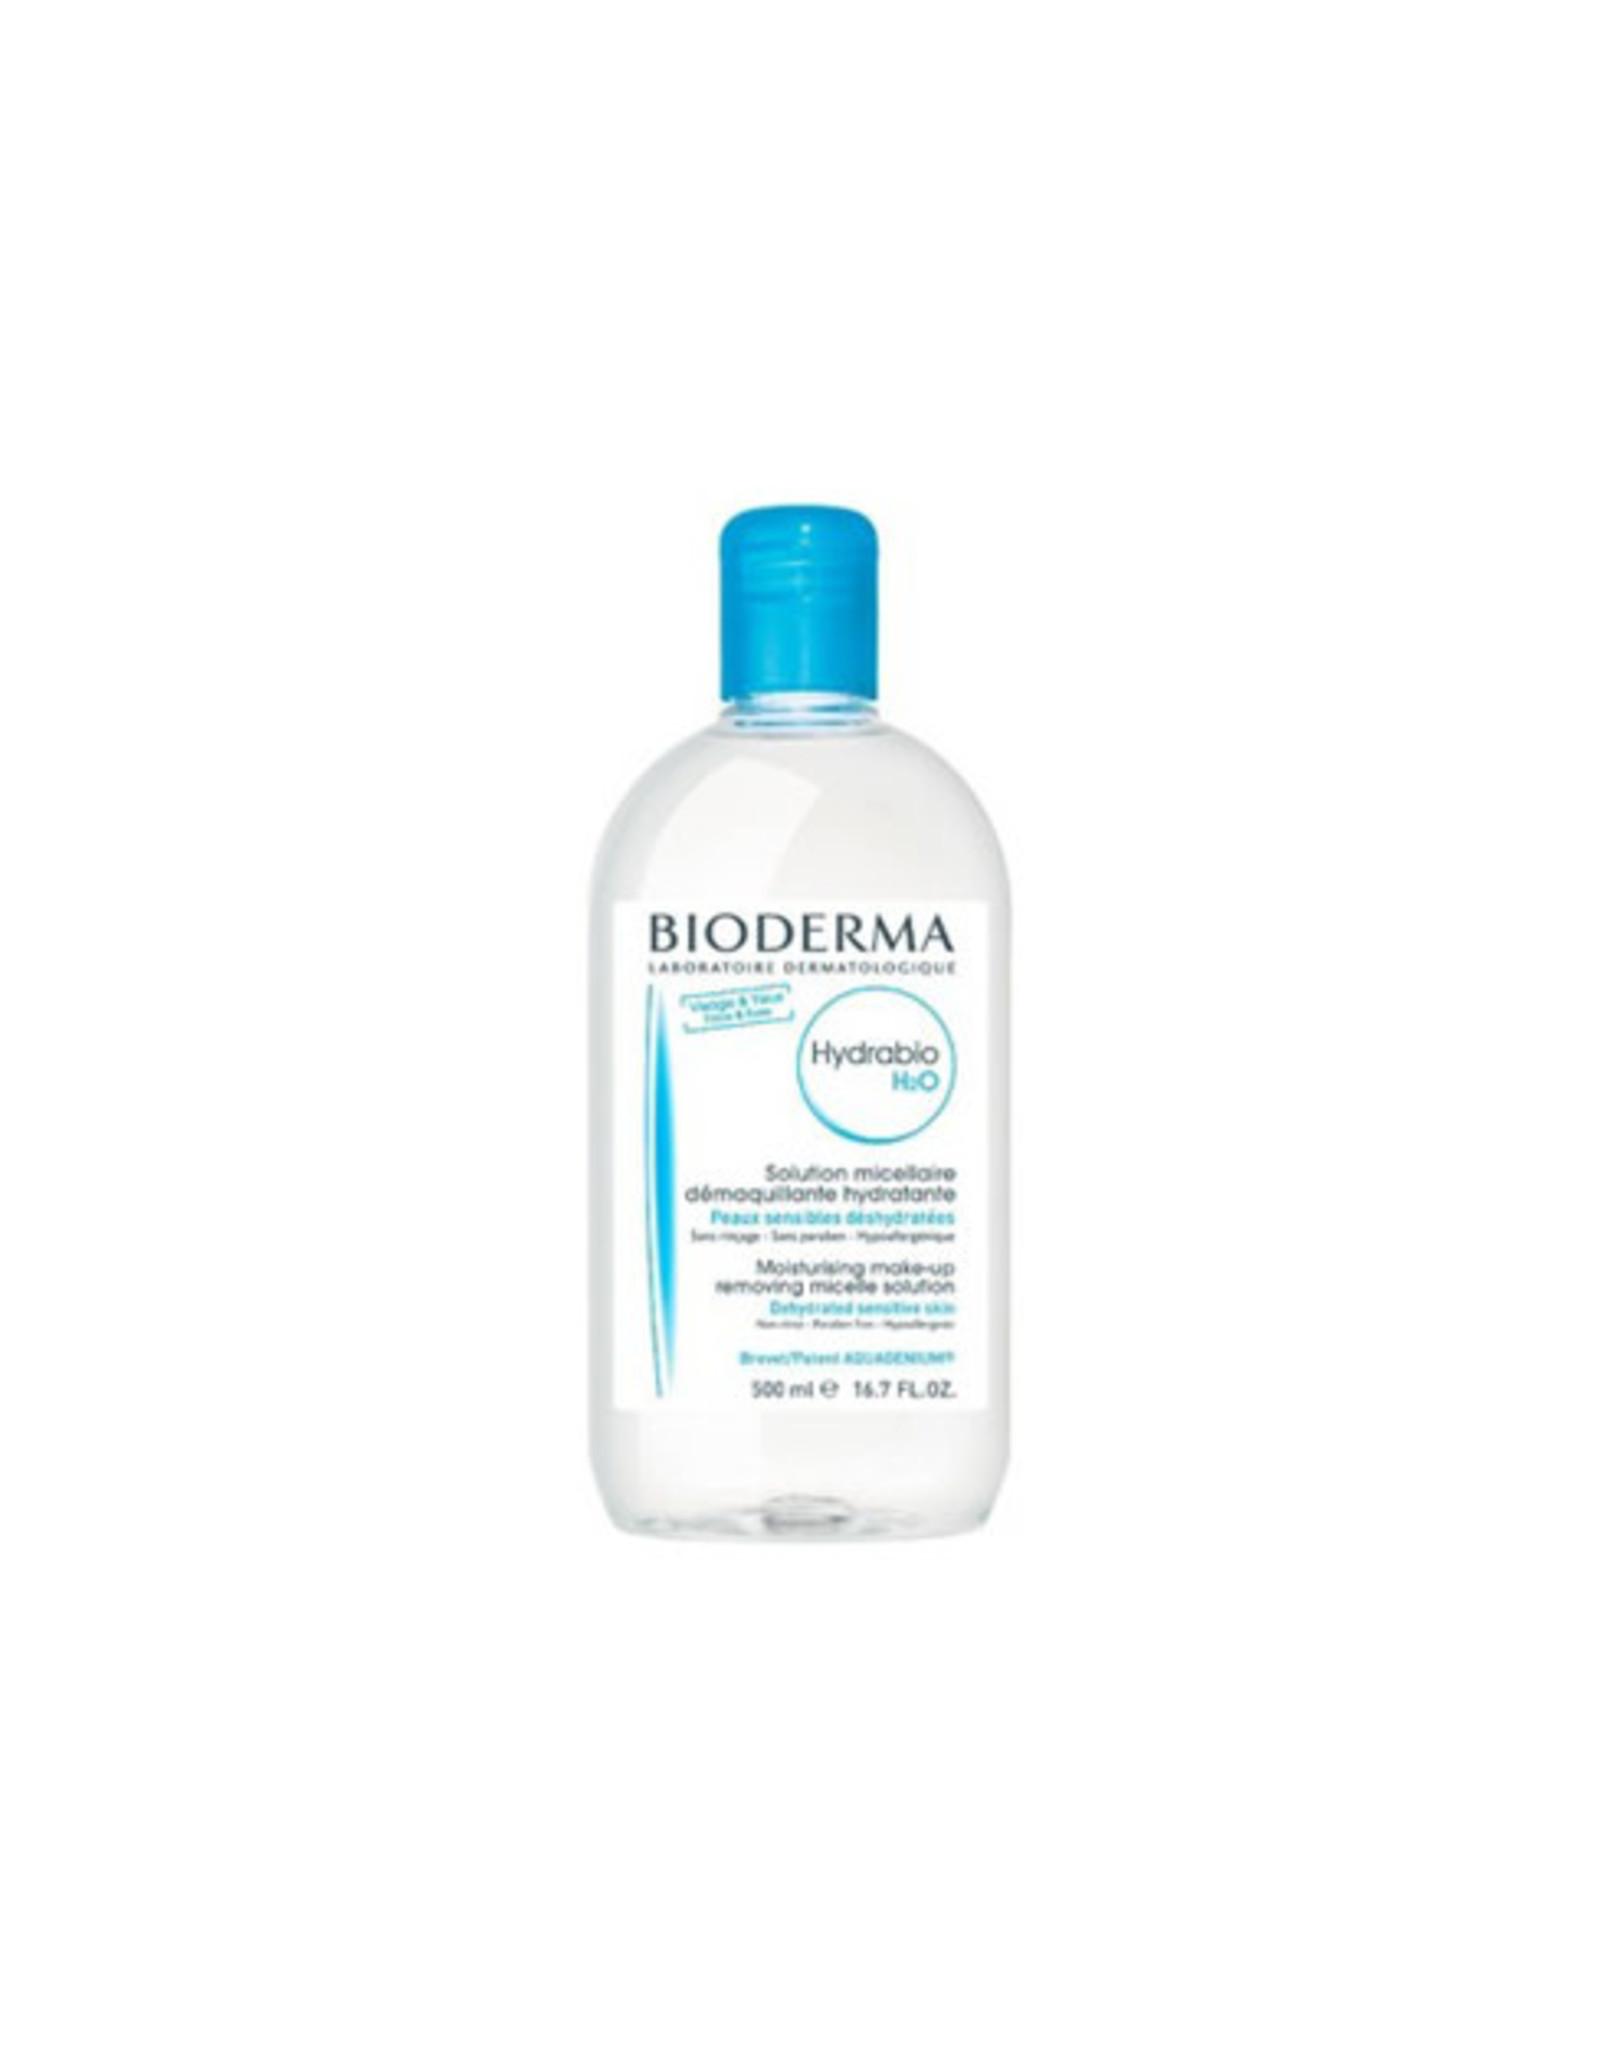 Bioderma Bioderma Hydrabio H2O Micellar Water For Dehydrated Sensitive Skin 500ml